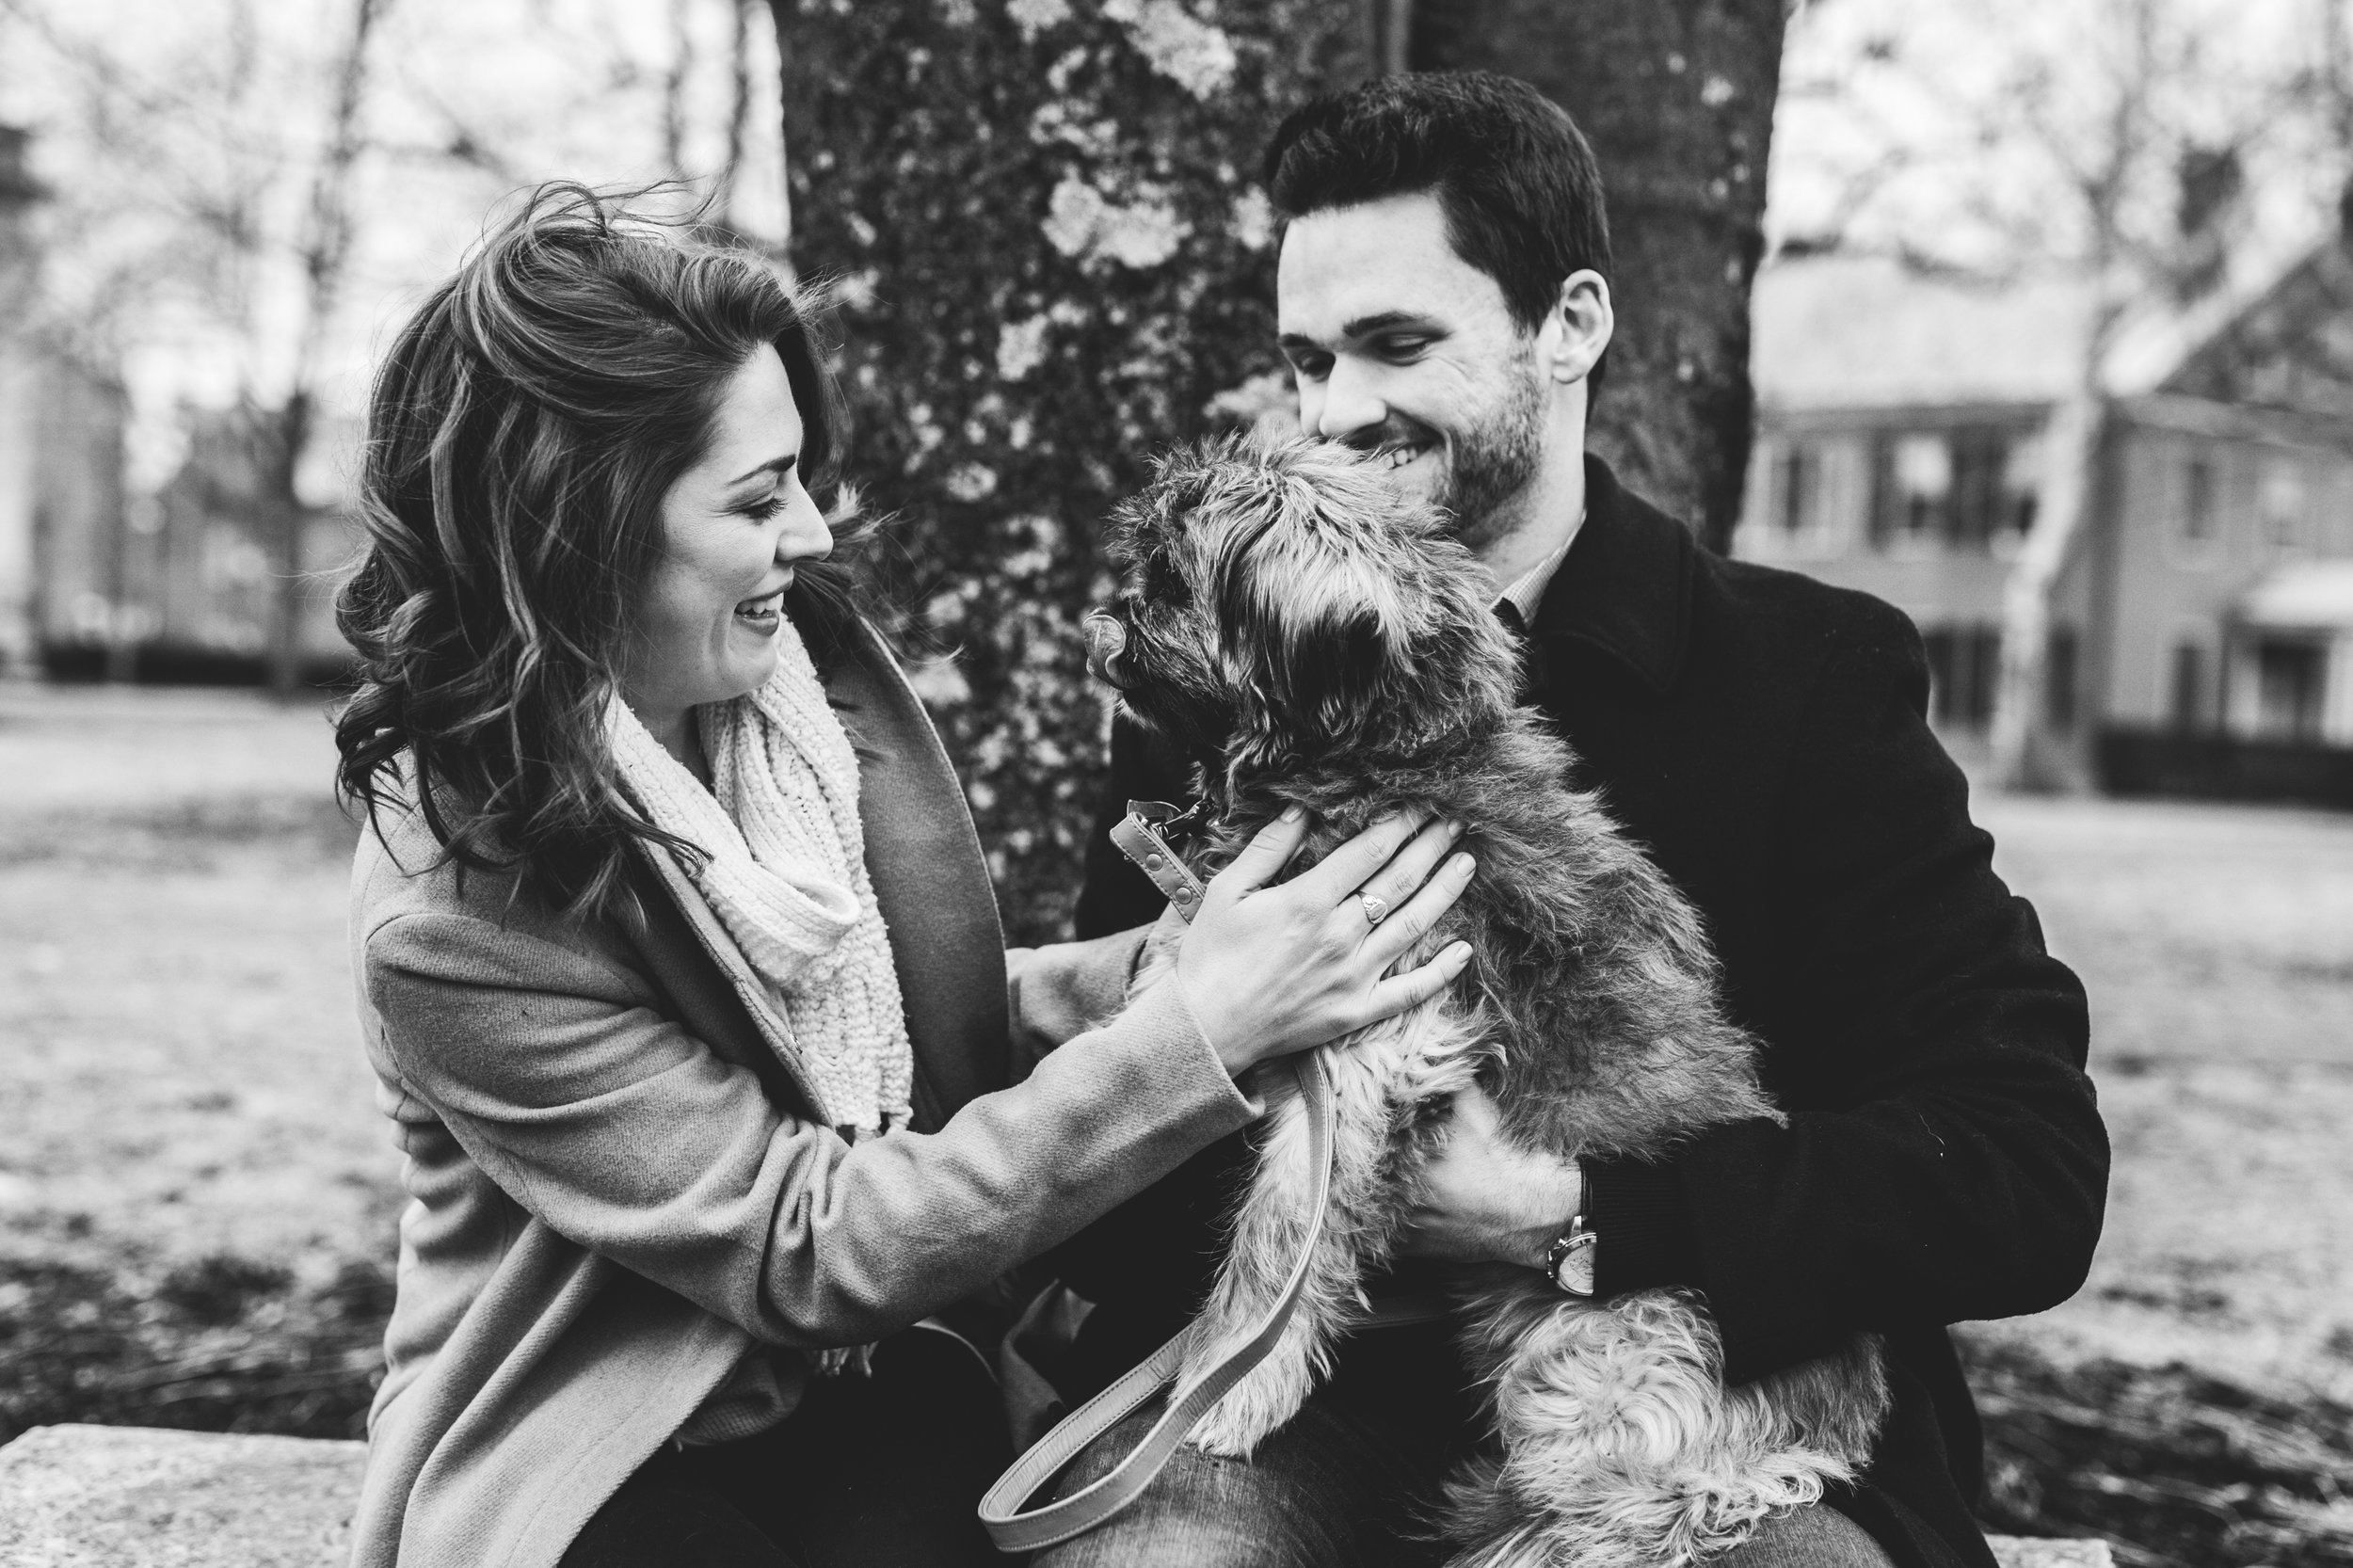 Ellen & Lee Engagement 2018 WEBSITE SP Crystal Ludwick Photo (29 of 54).jpg